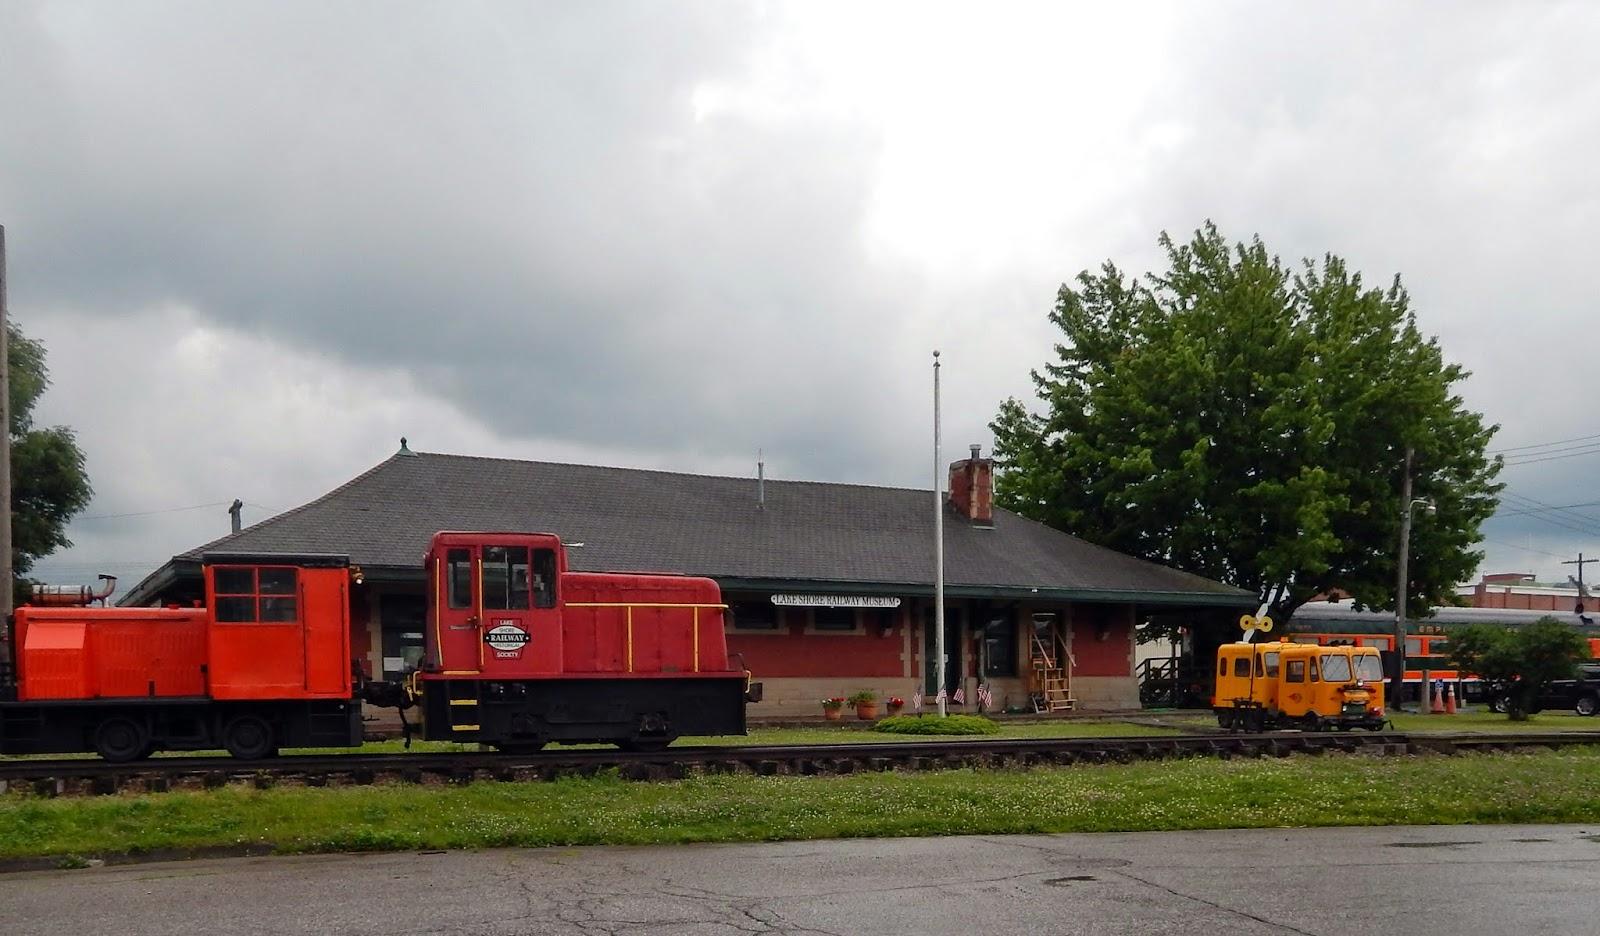 lakeshore railway museum in north east pa